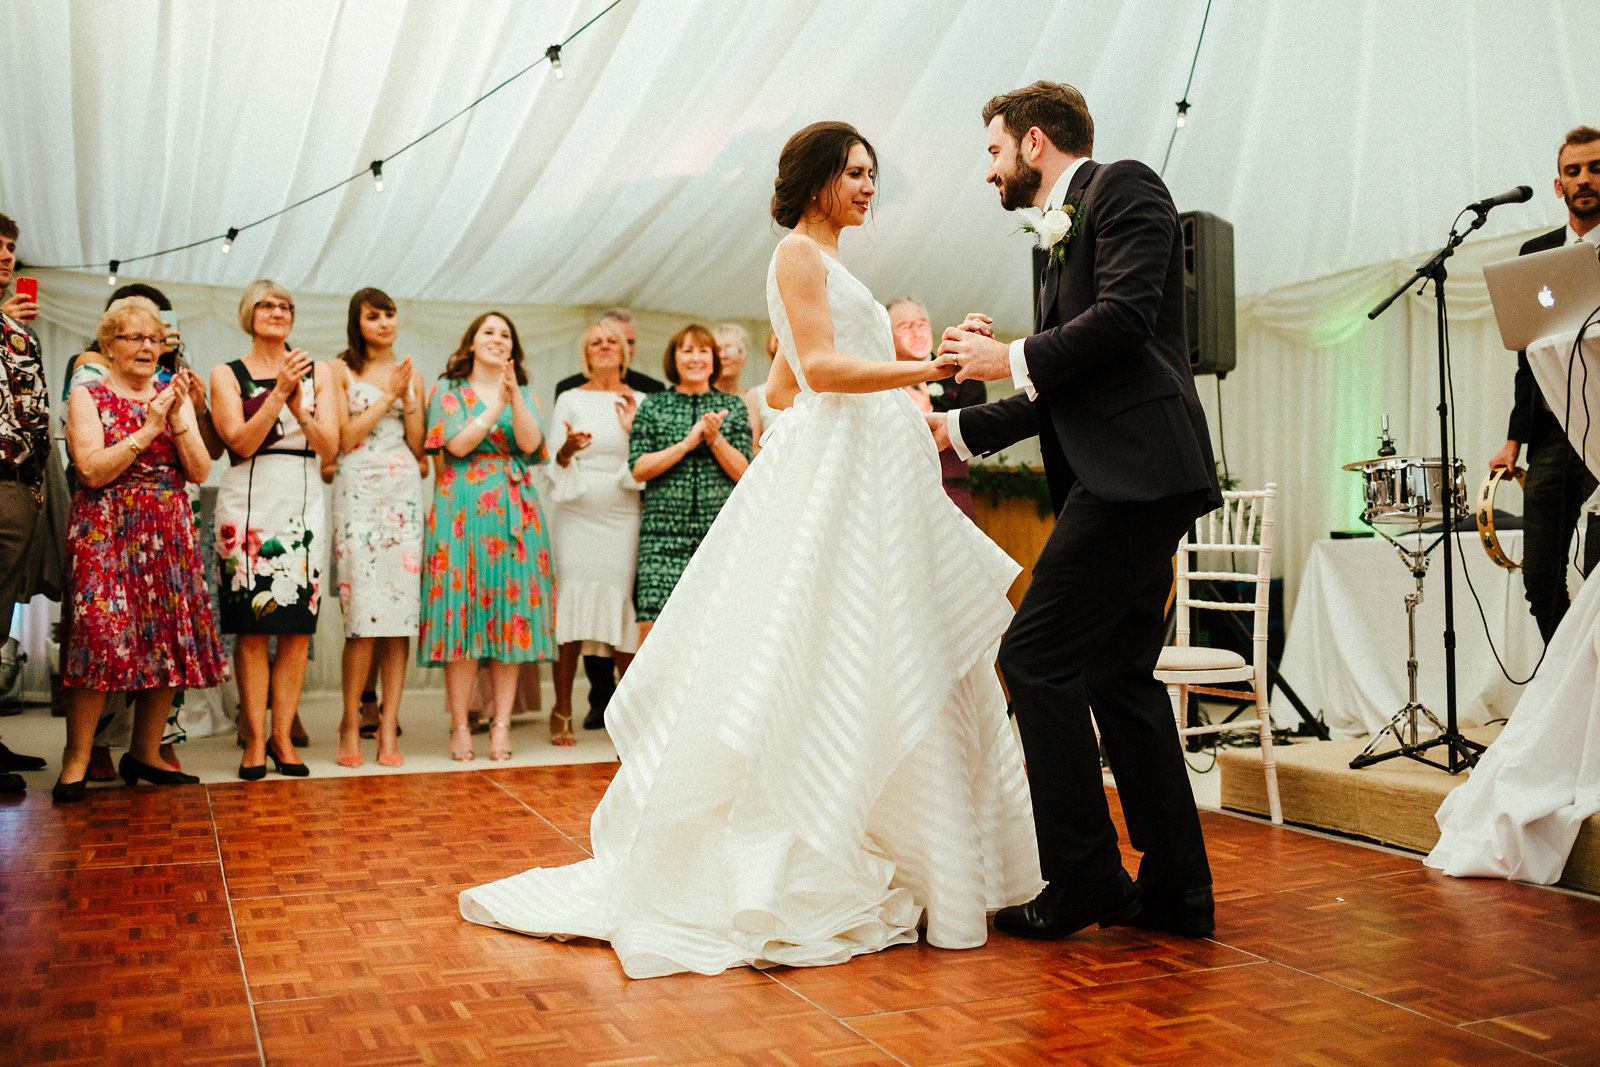 Jewsih wedding day photography